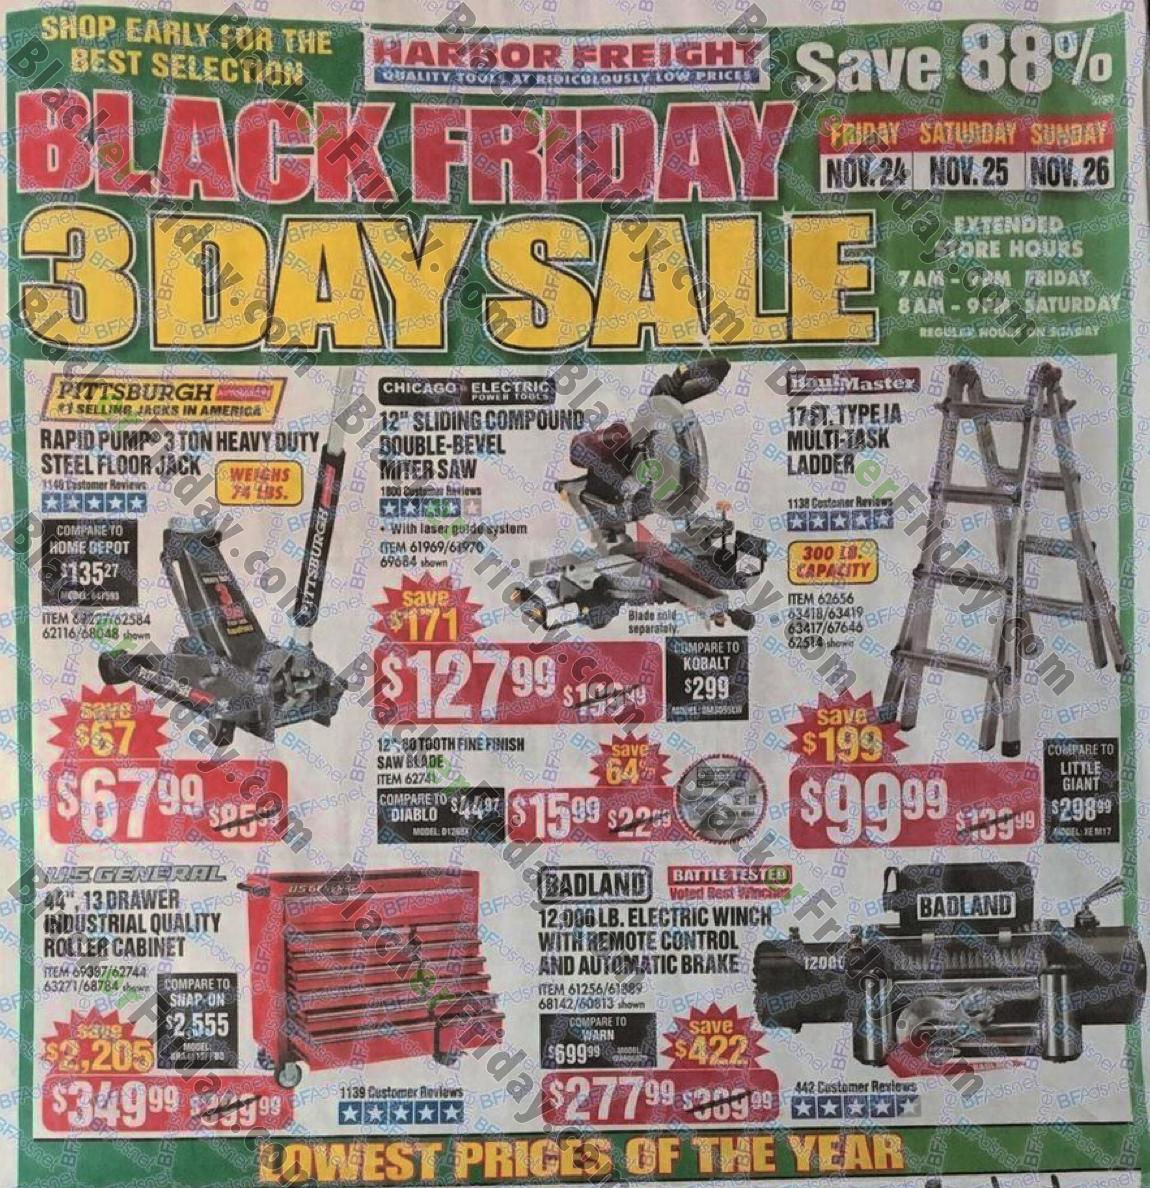 harbor freight tools black friday 2018 sale ad scan blacker friday. Black Bedroom Furniture Sets. Home Design Ideas